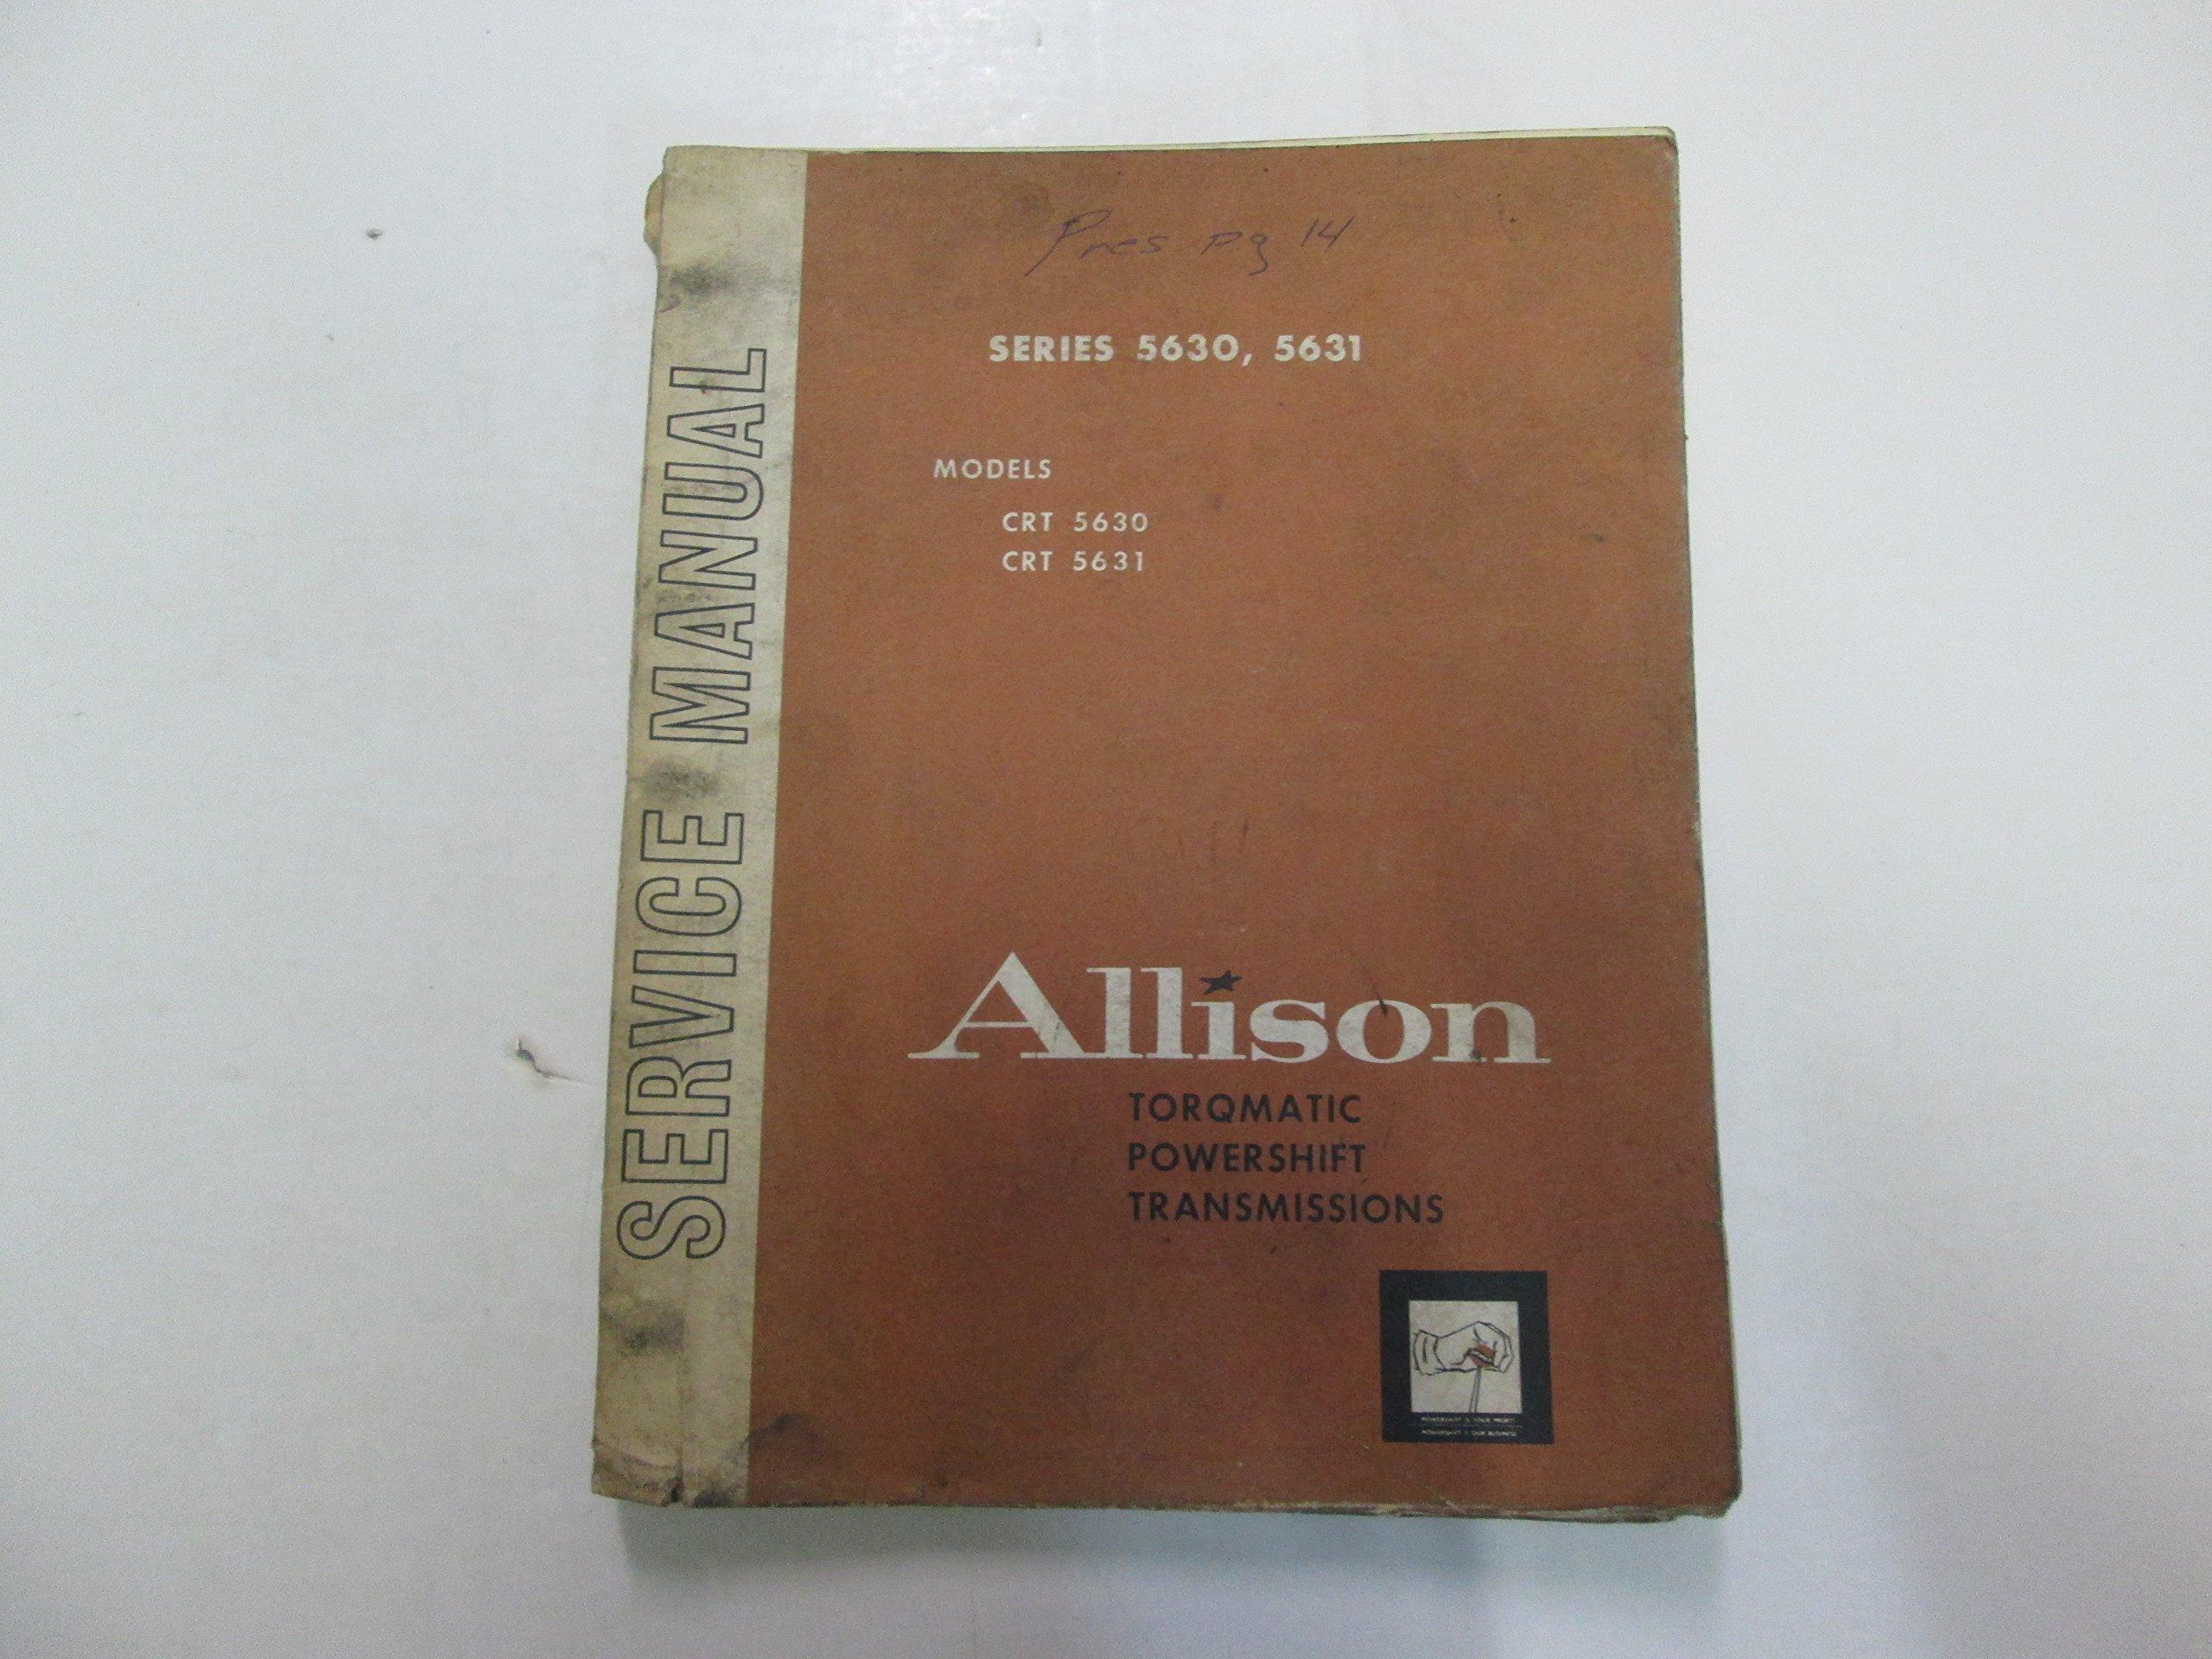 1968 Allison Series 5630 5631 Models CRT Torqmatic Service Manual WATER  STAINS: Allison: Amazon.com: Books